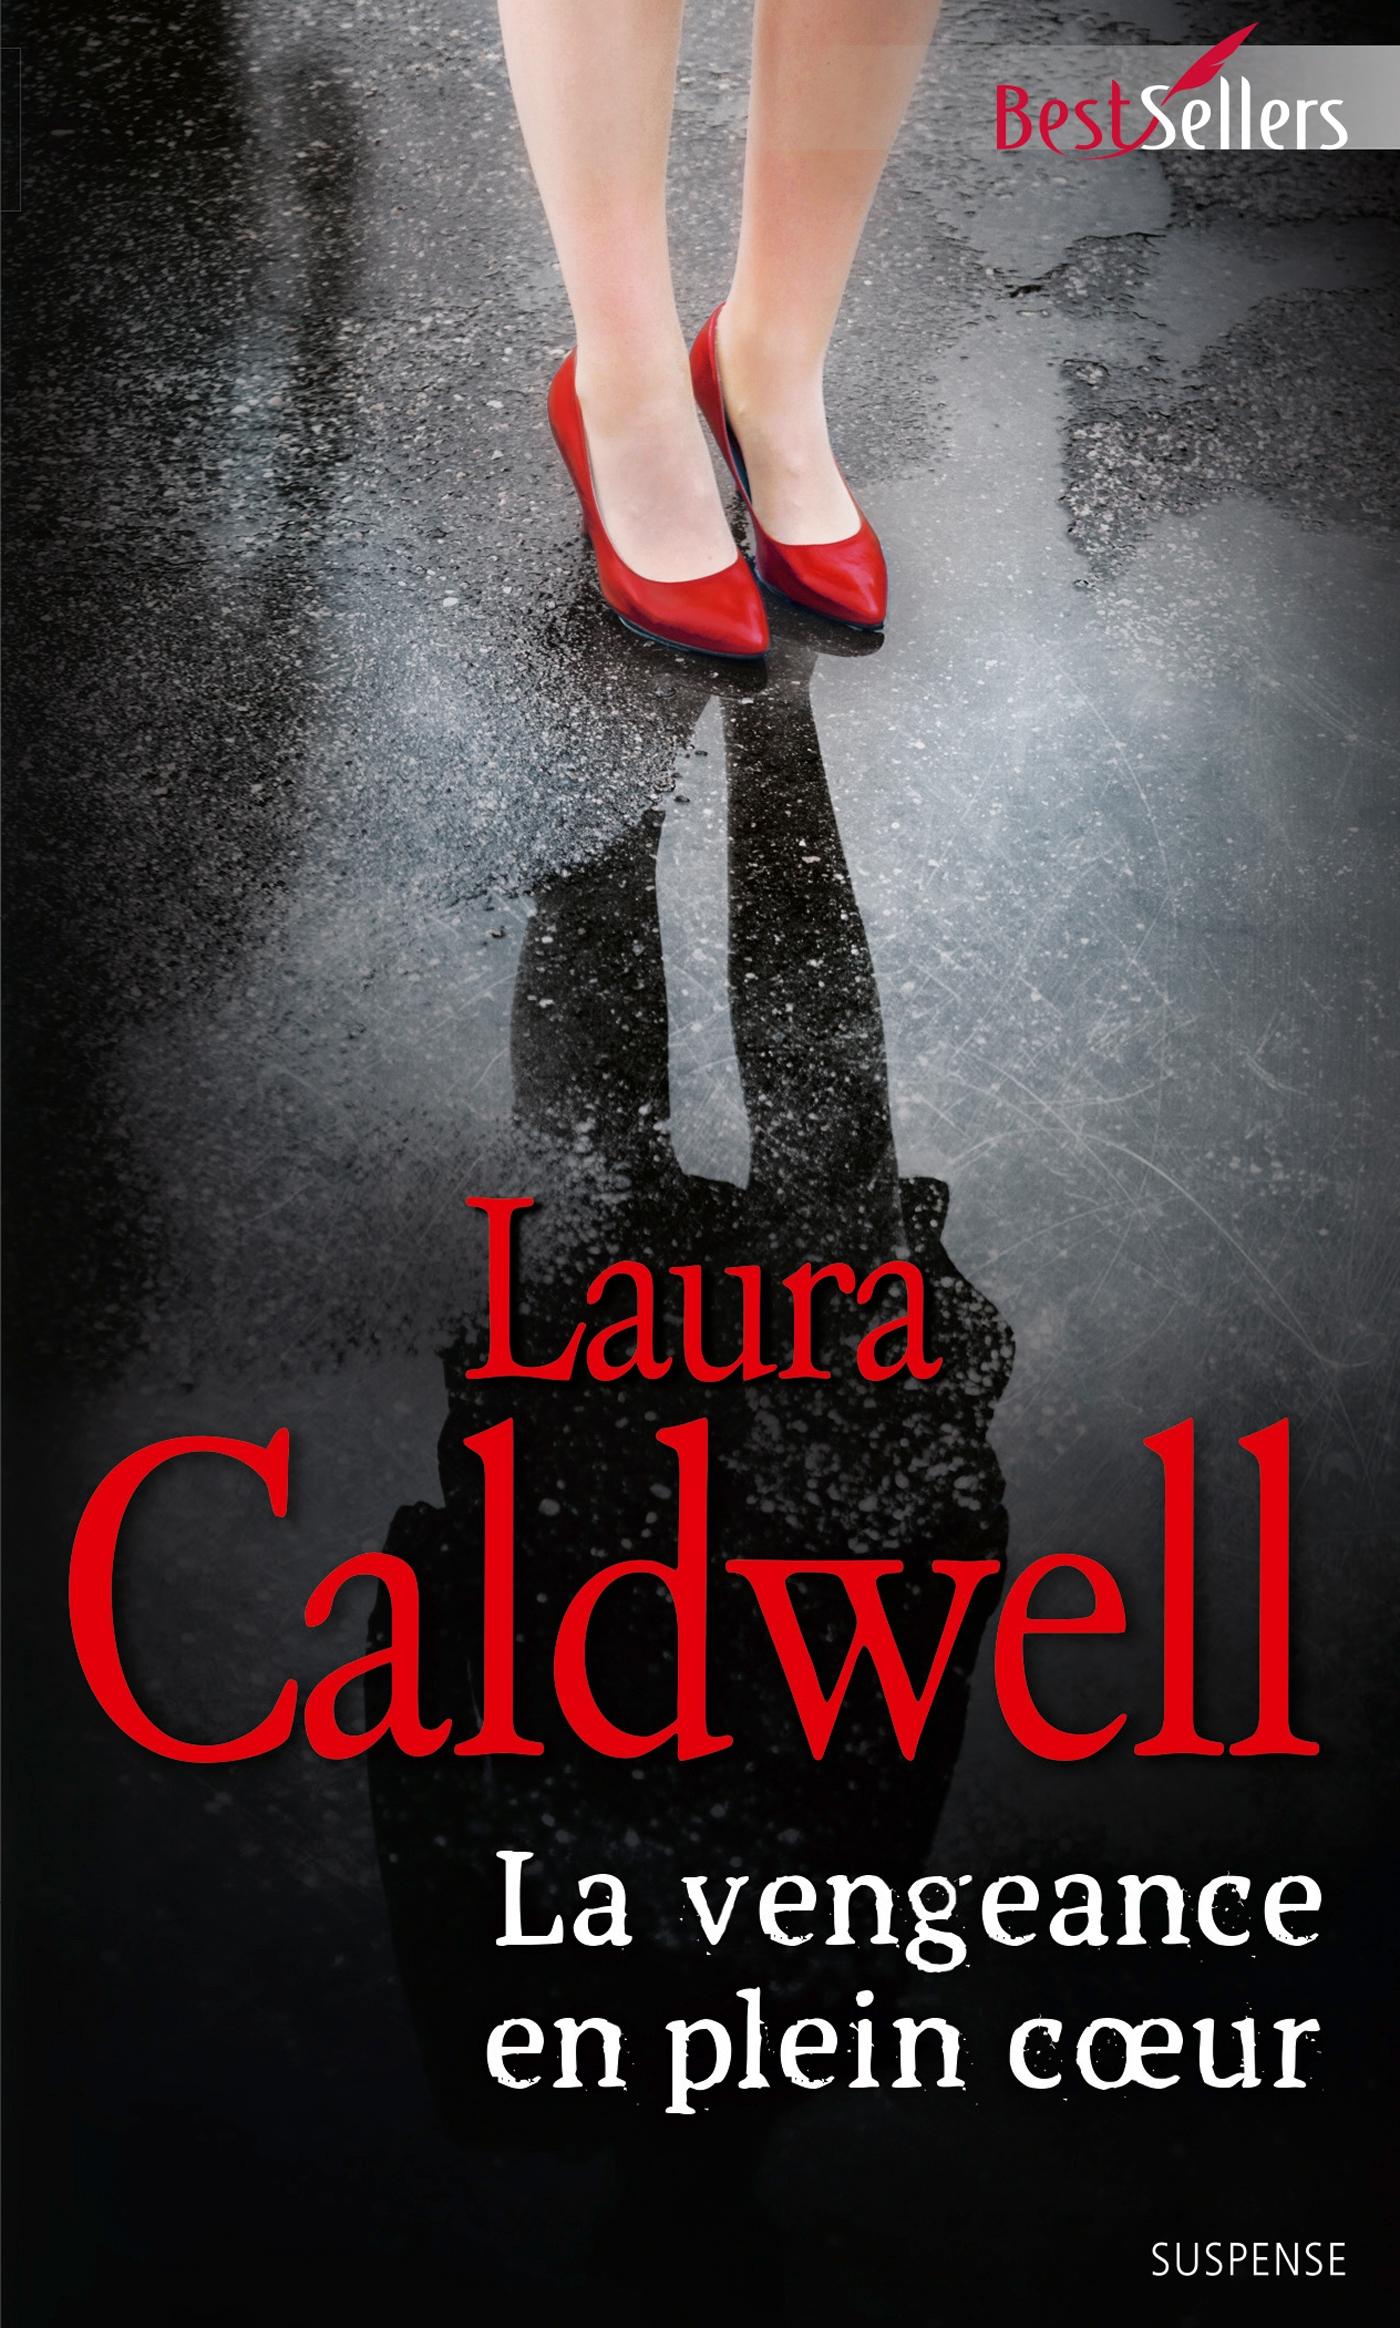 La vengeance en plein coeur - Laura Caldwell